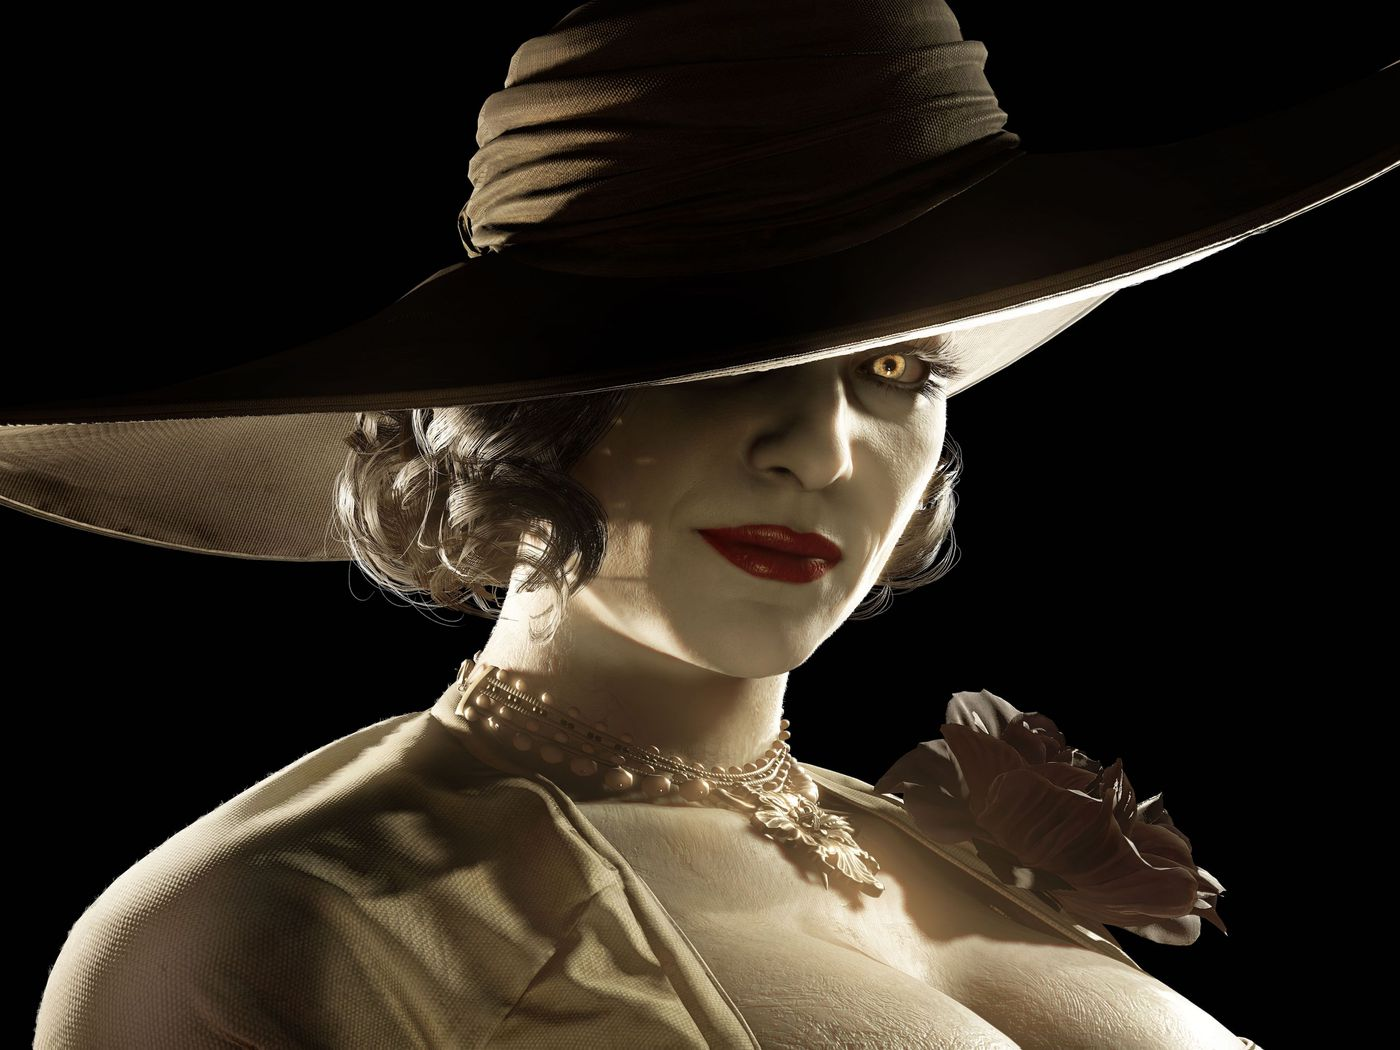 Resident Evil Village's Lady Dimitrescu stole the show on Amazon, Steam - Polygon